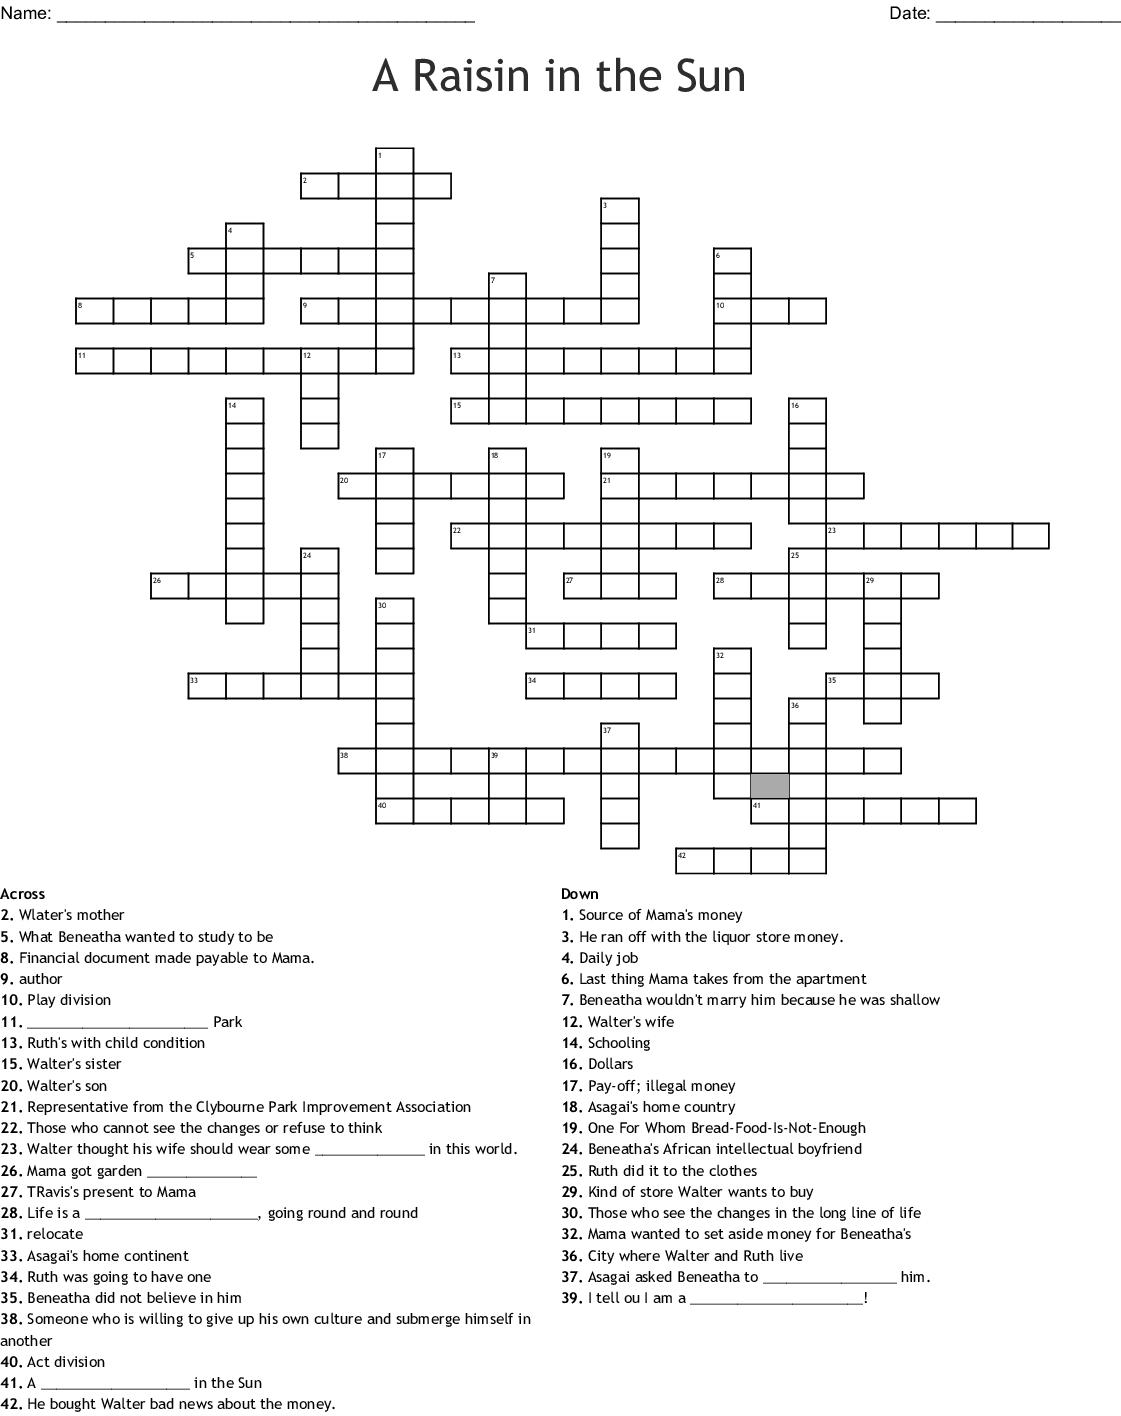 A Raisin In The Sun Crossword